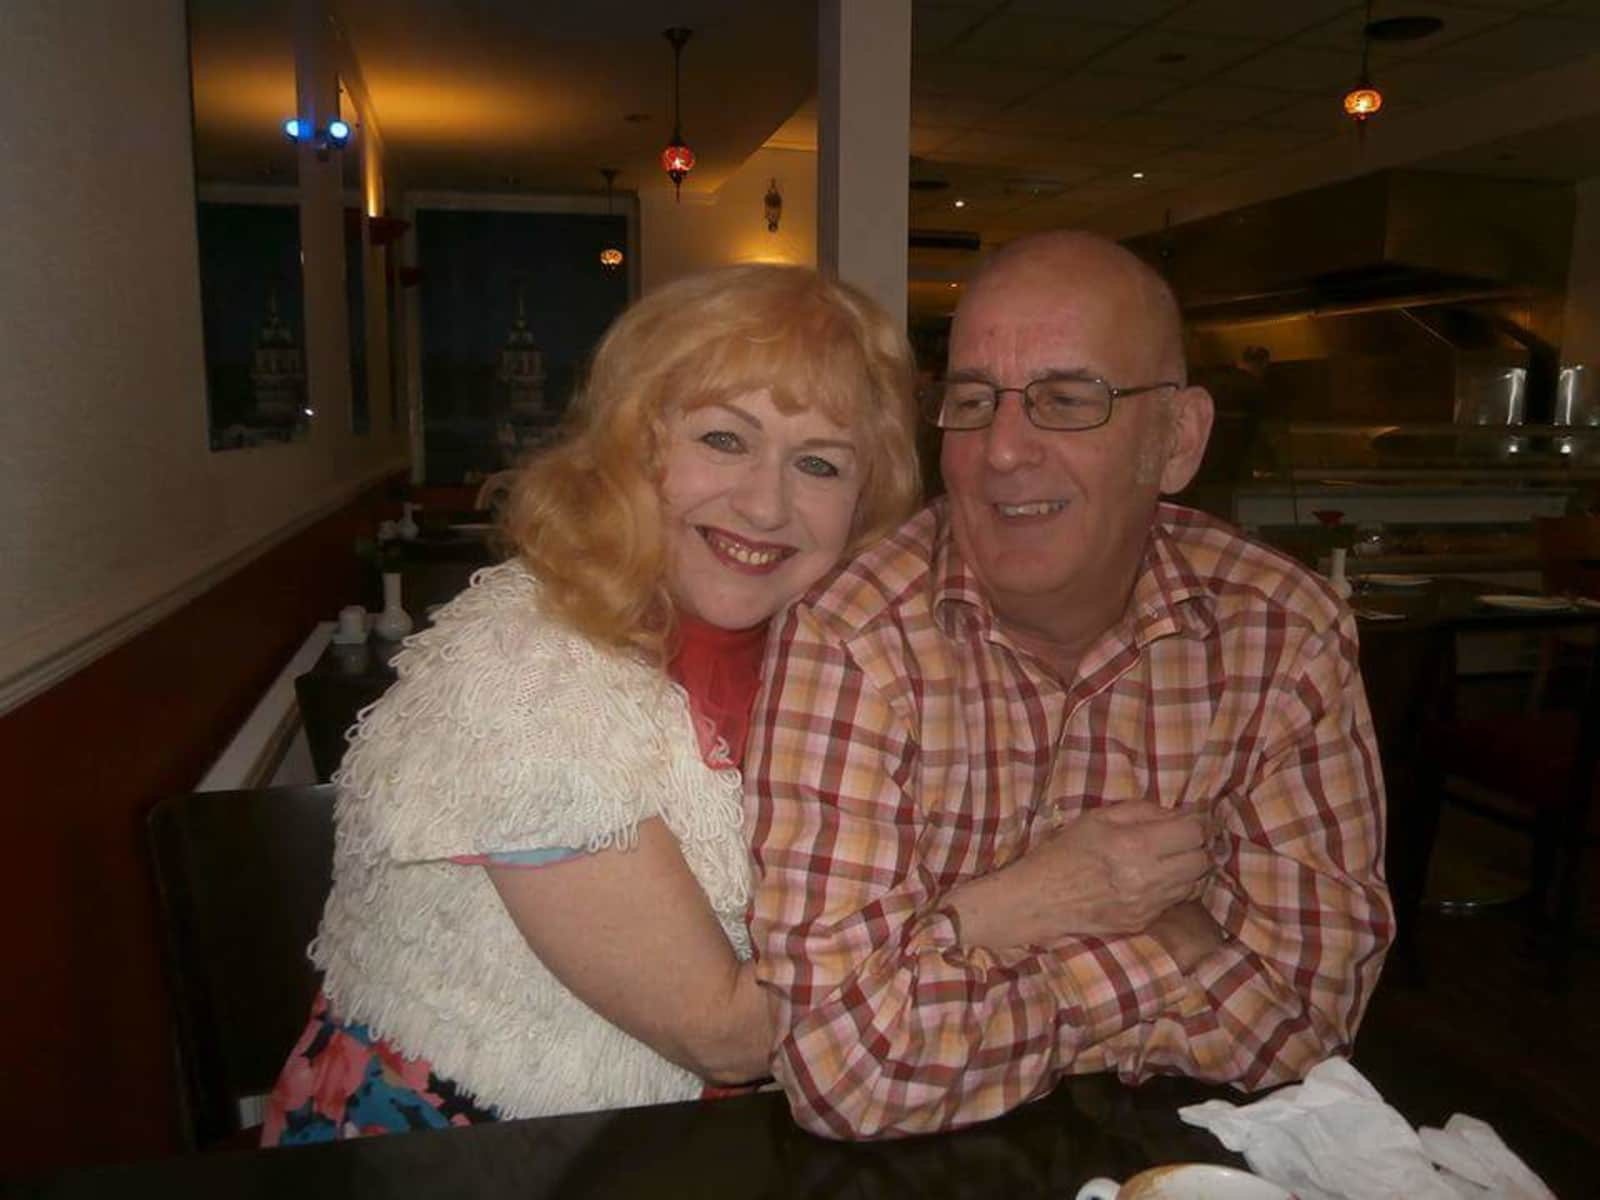 Norman & Yvonne from Westcliff-on-Sea, United Kingdom